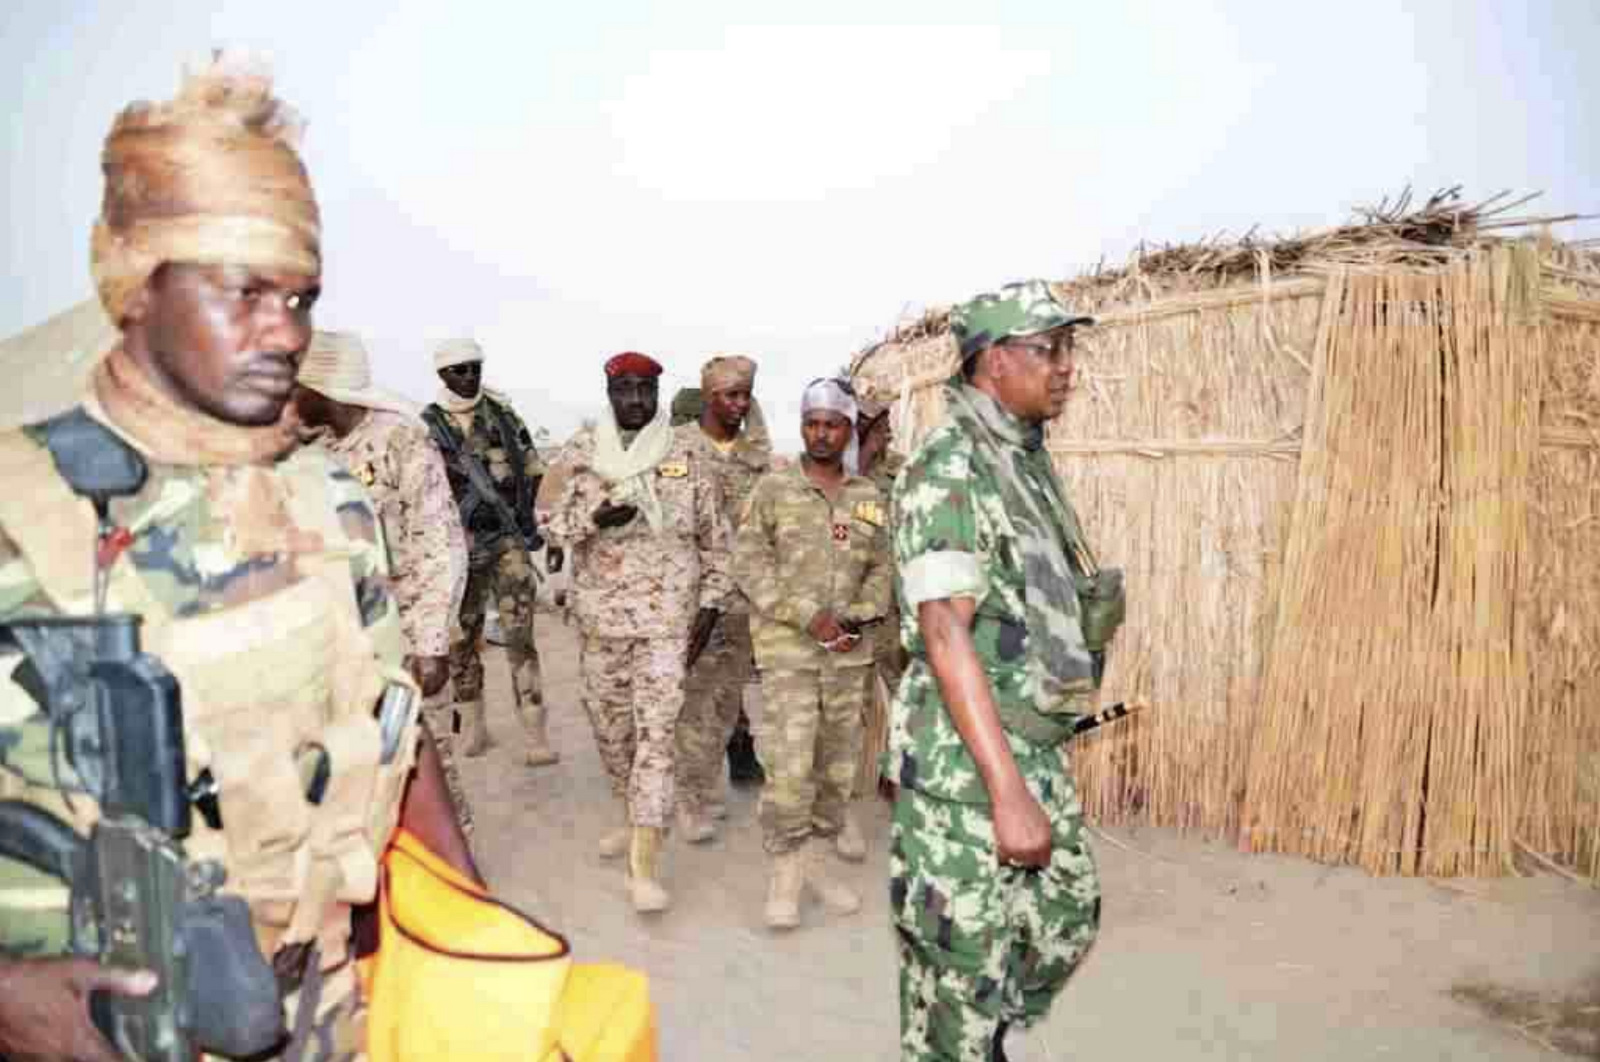 44 membres de Boko Haram retrouvés morts en prison — Tchad